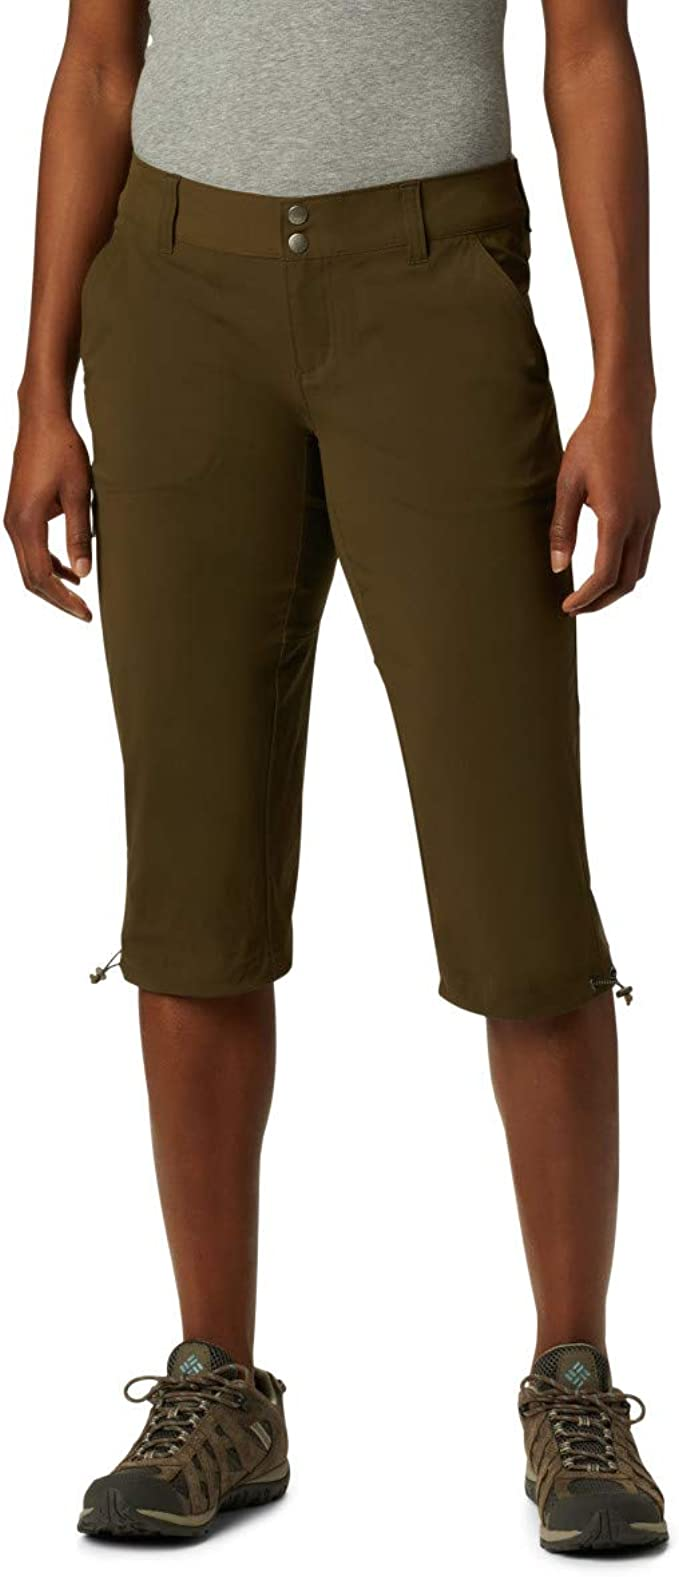 Pantal/ón de Senderismo para Mujer Mujer Columbia Adventure Hiking Pant